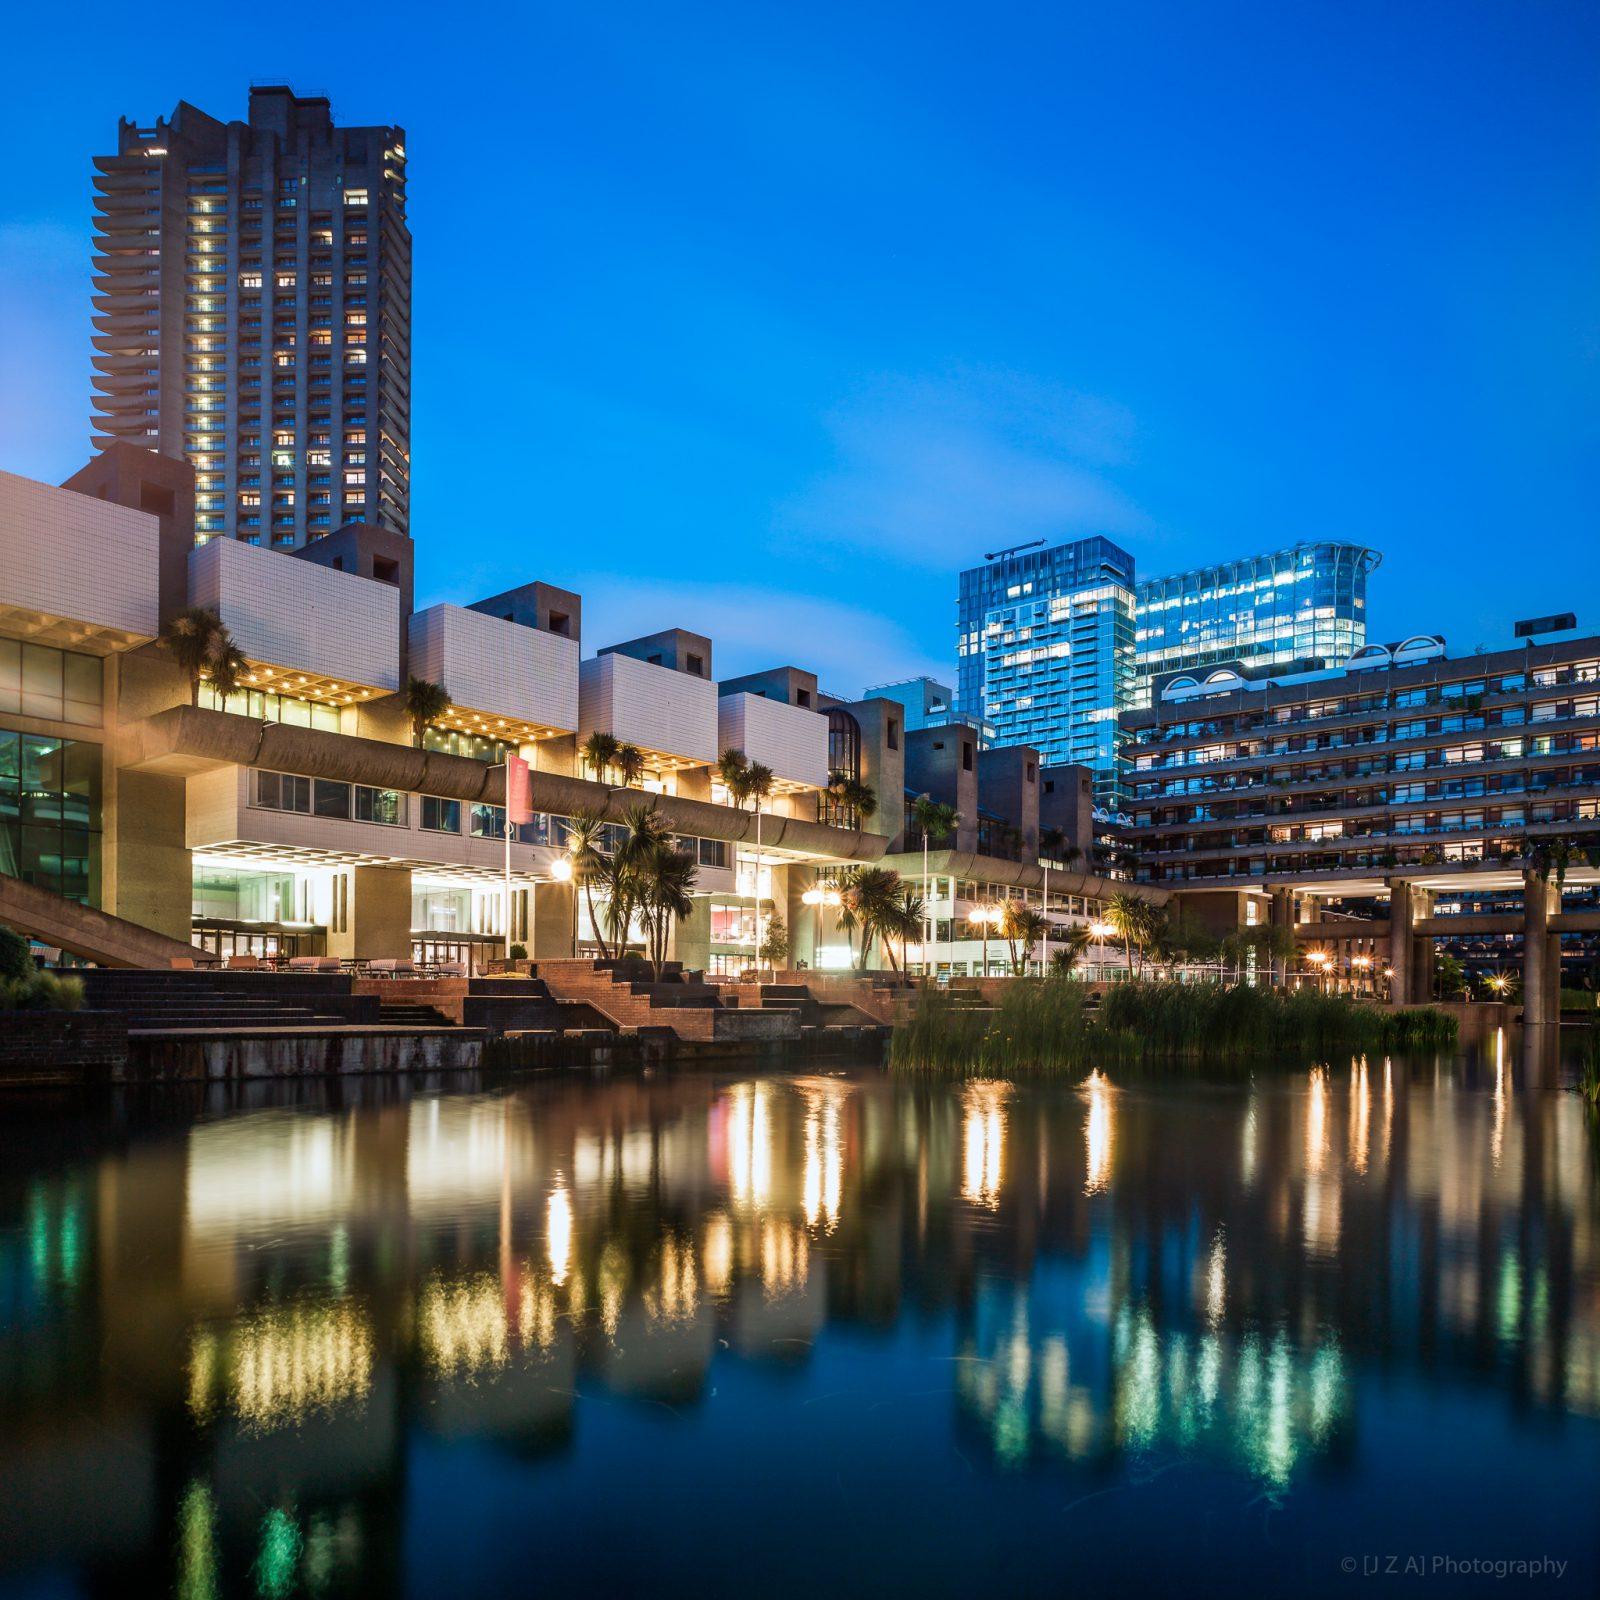 Barbican Centre and Lake